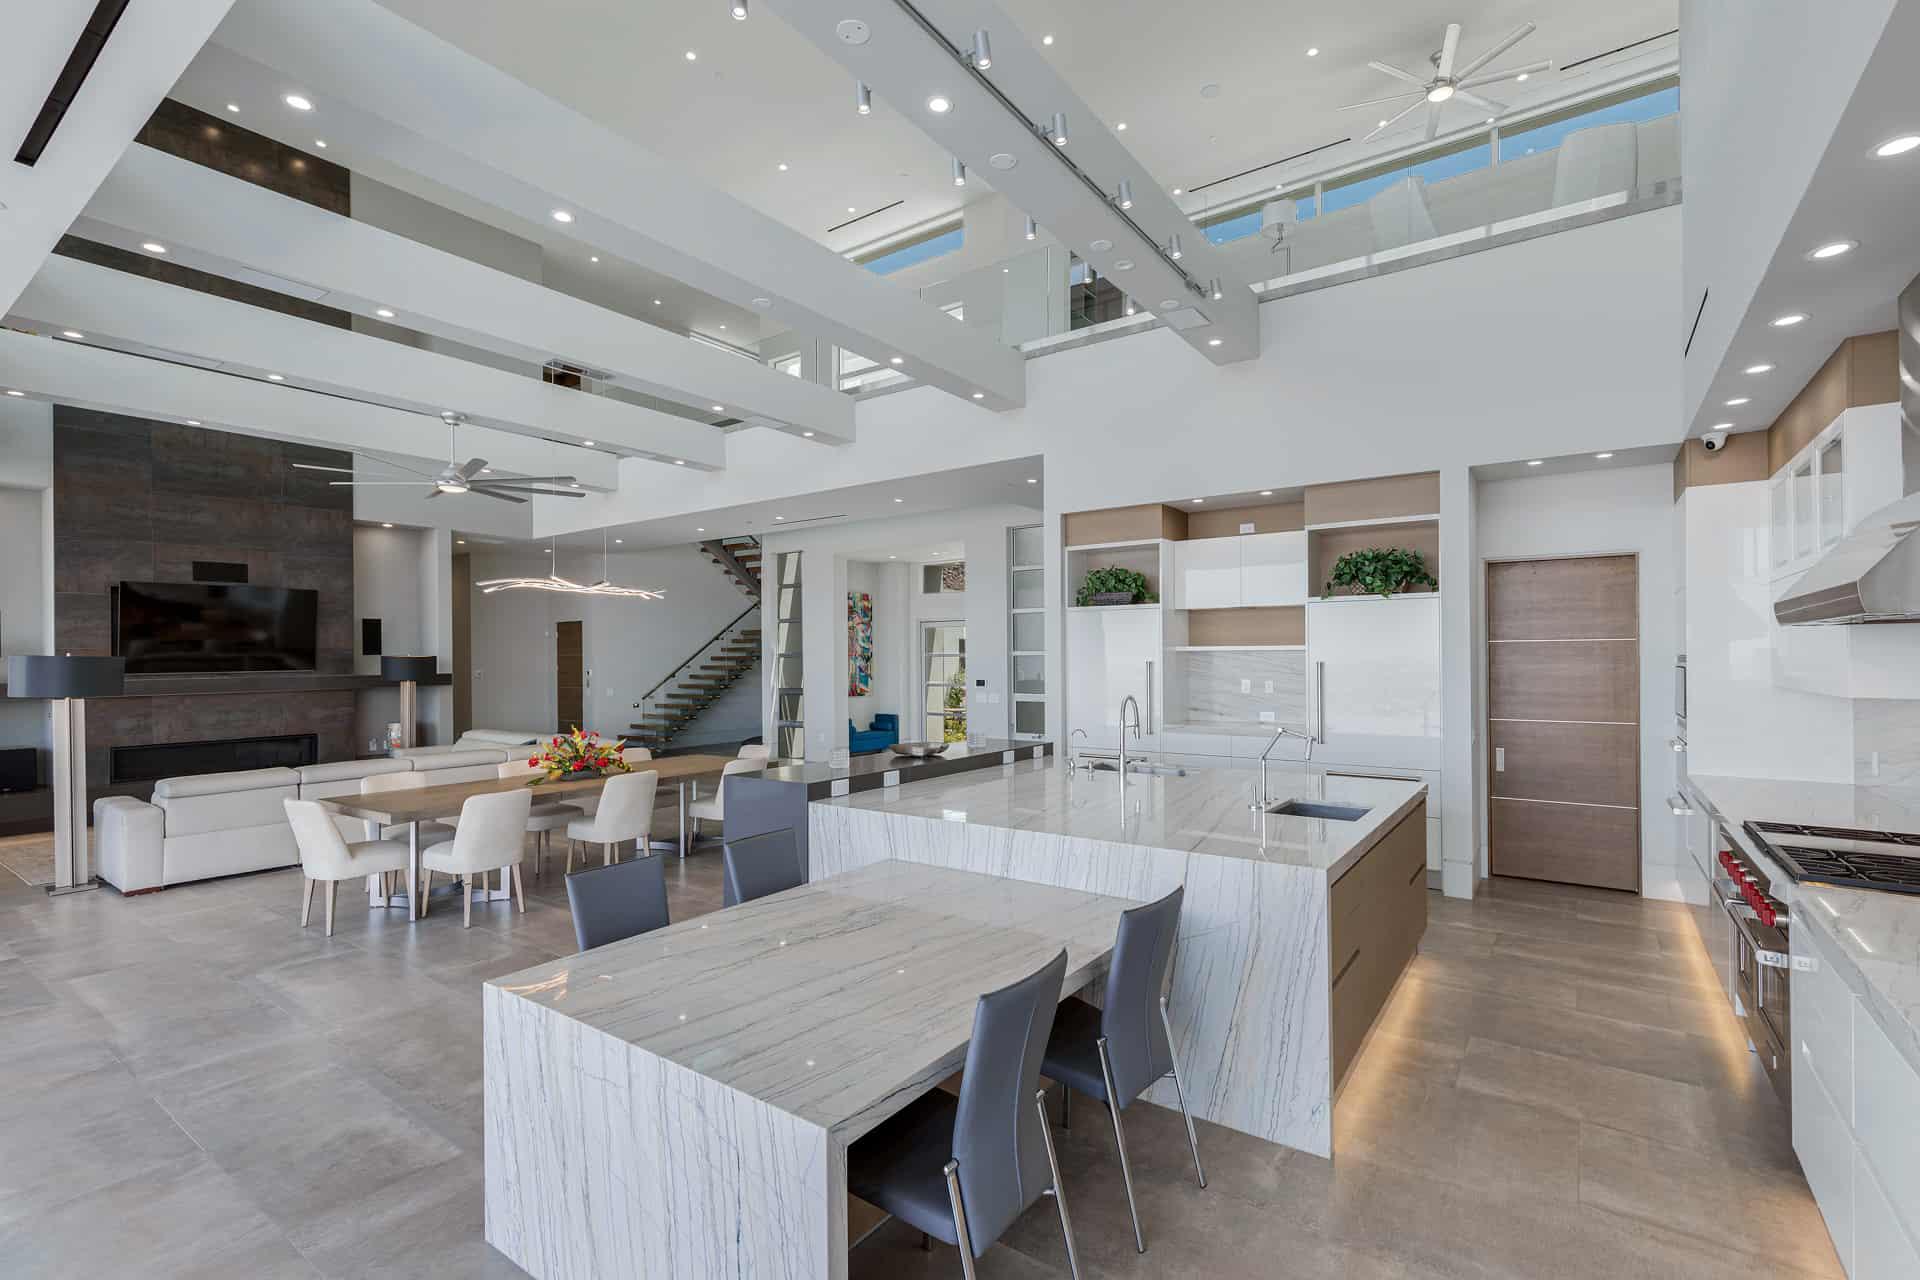 las-vegas-luxry-real-estate-realtor-rob-jensen-company-5-rockstream-drive-ascaya033